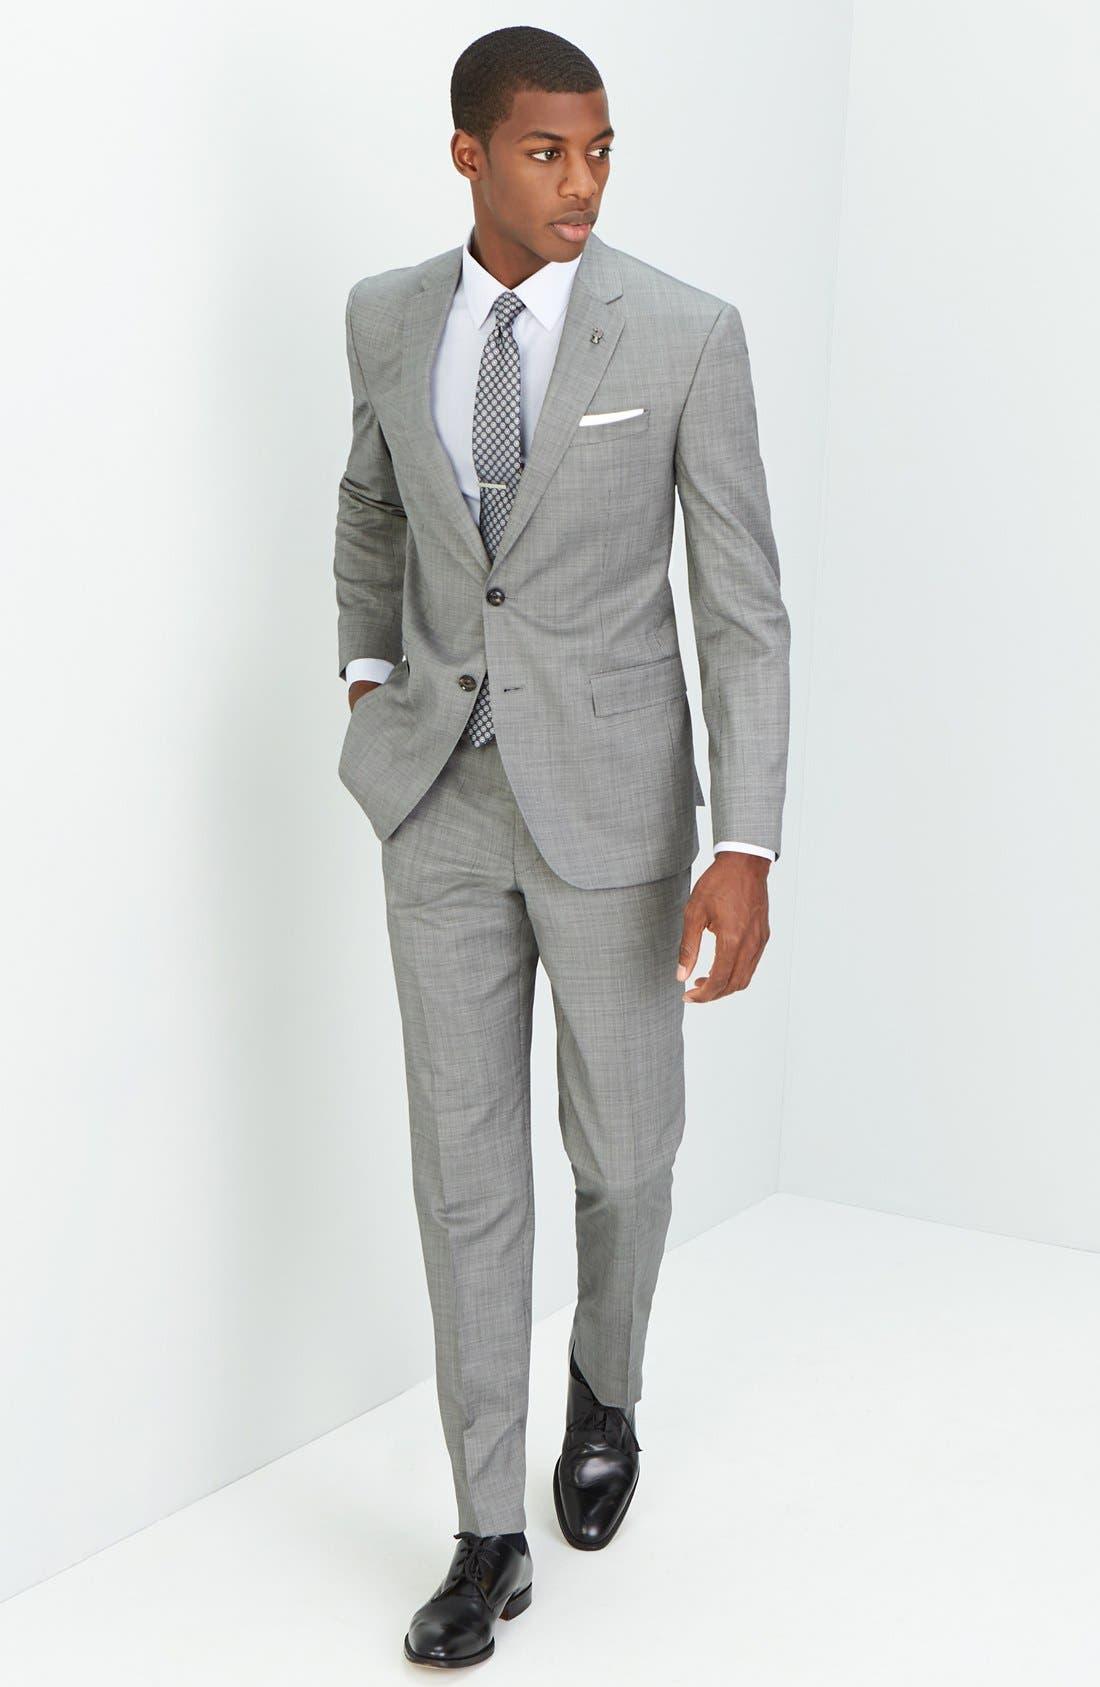 Jay Trim Fit Solid Wool Suit,                             Alternate thumbnail 18, color,                             LIGHT GREY